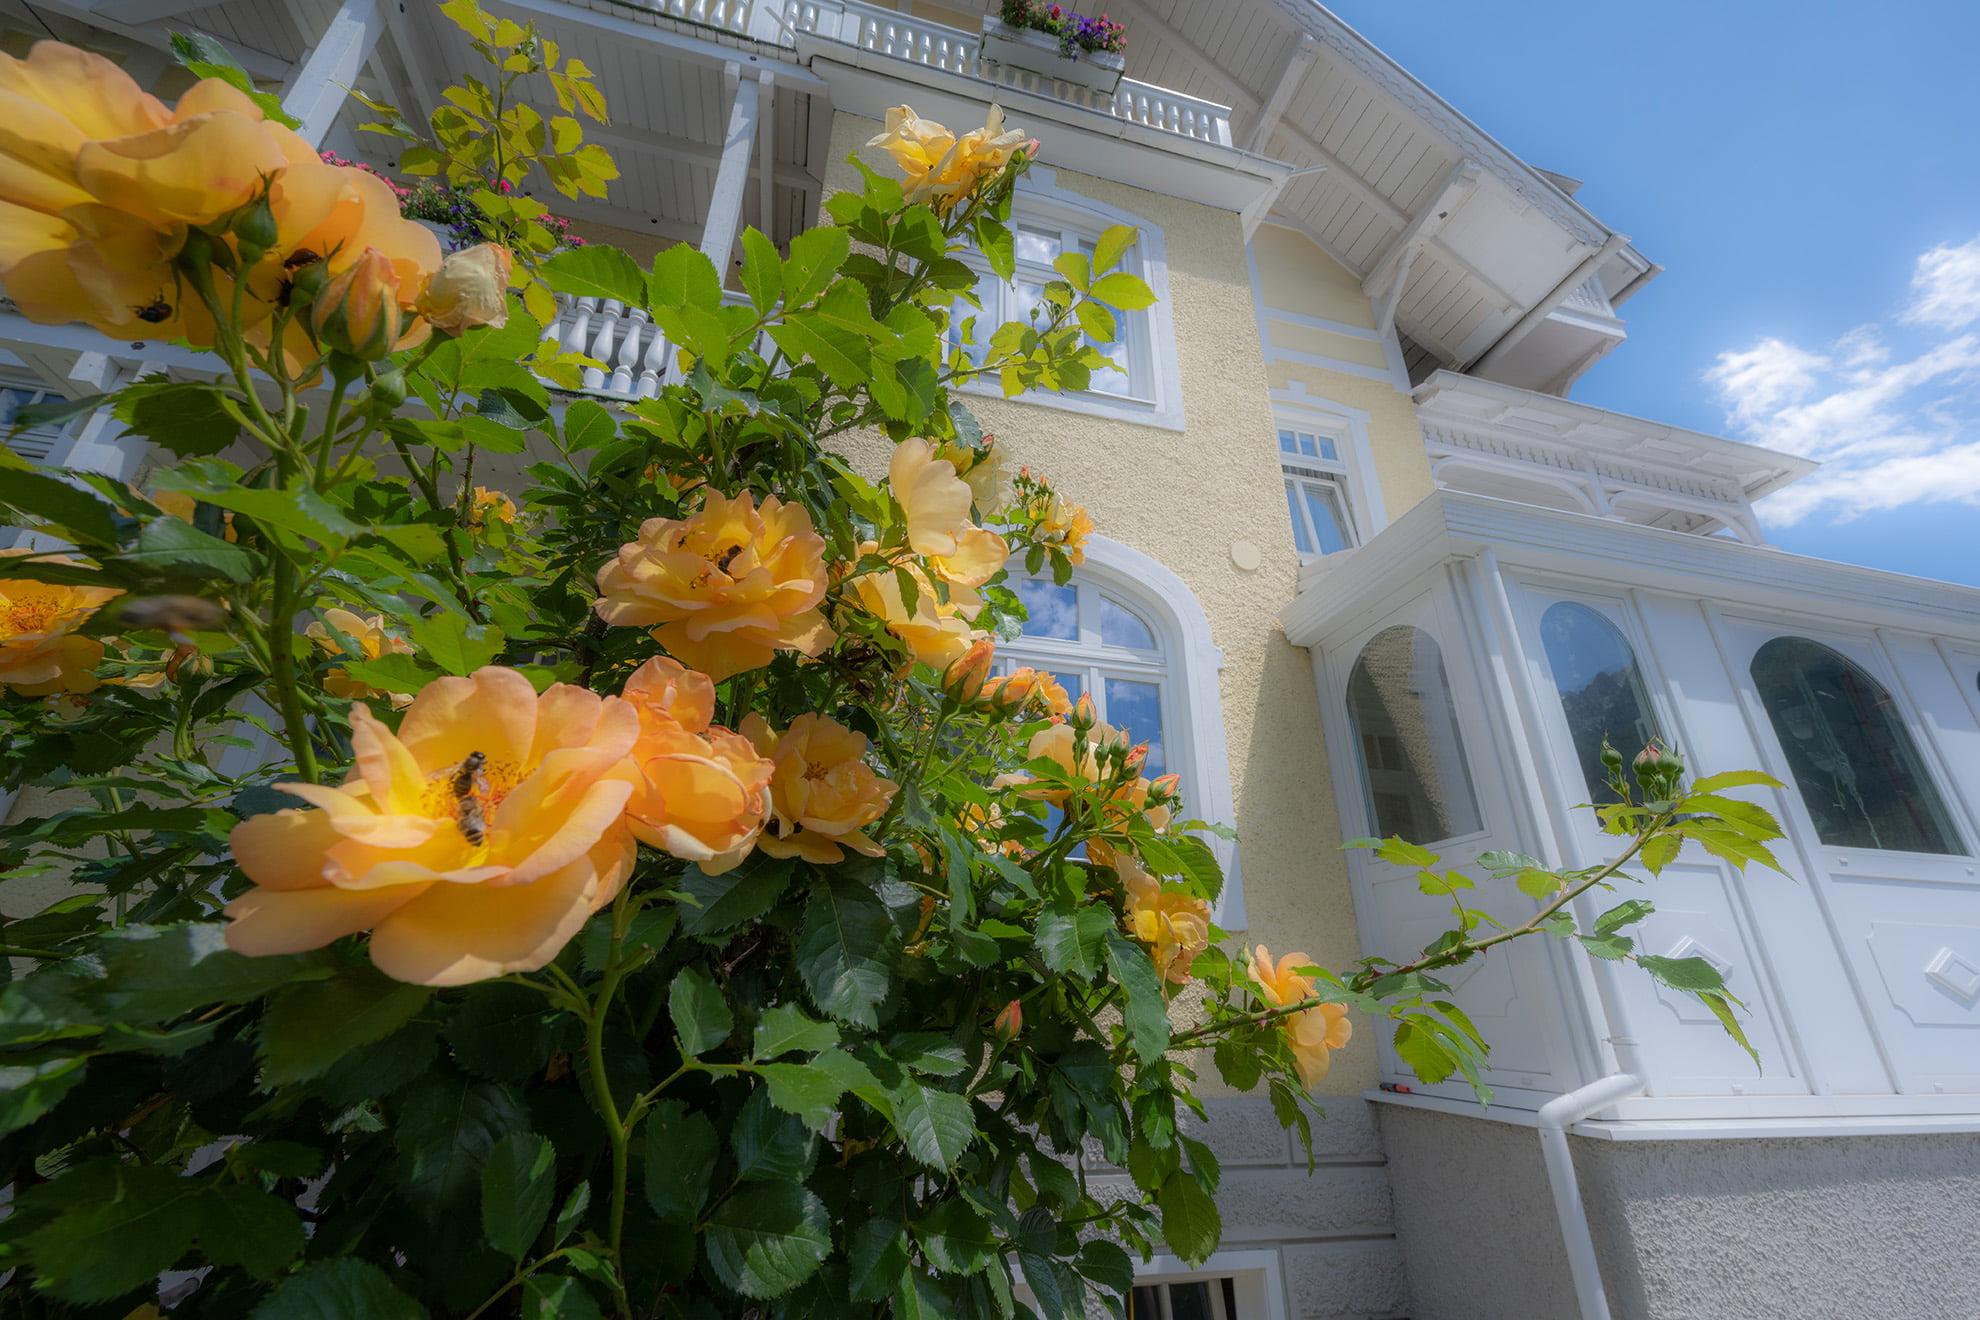 Gelbe Rosen im Hotel Garni Hubertus Garten